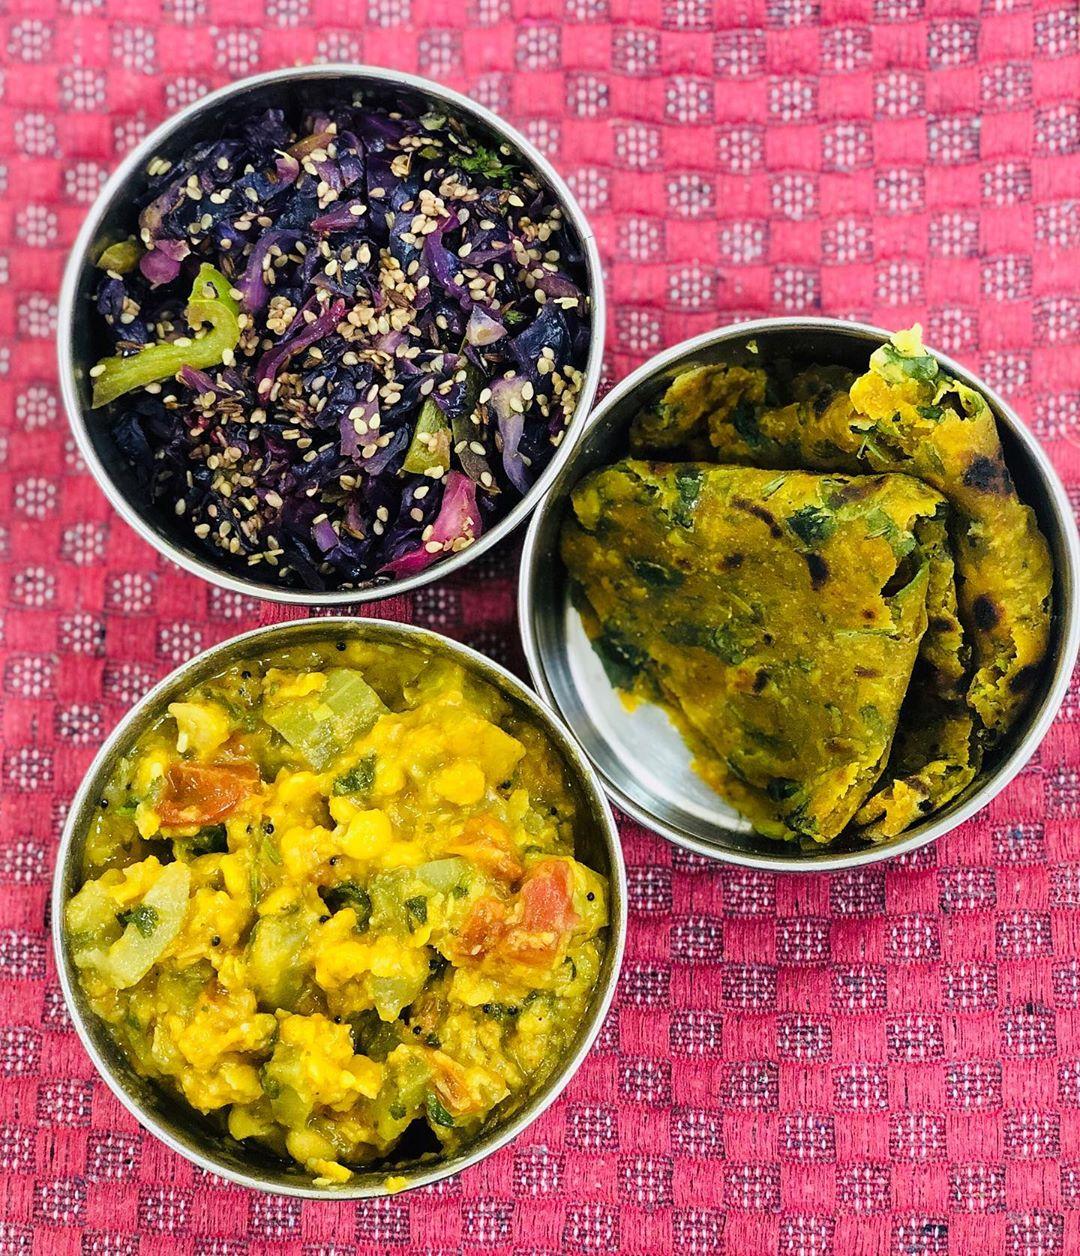 Komal Patel,  lunchbox, lunchboxidea, healthylunchbox, indianlunchbox, lunchideas, dietitianmeal, komalpatel, balancedmeal, veggies, kptiffinideas